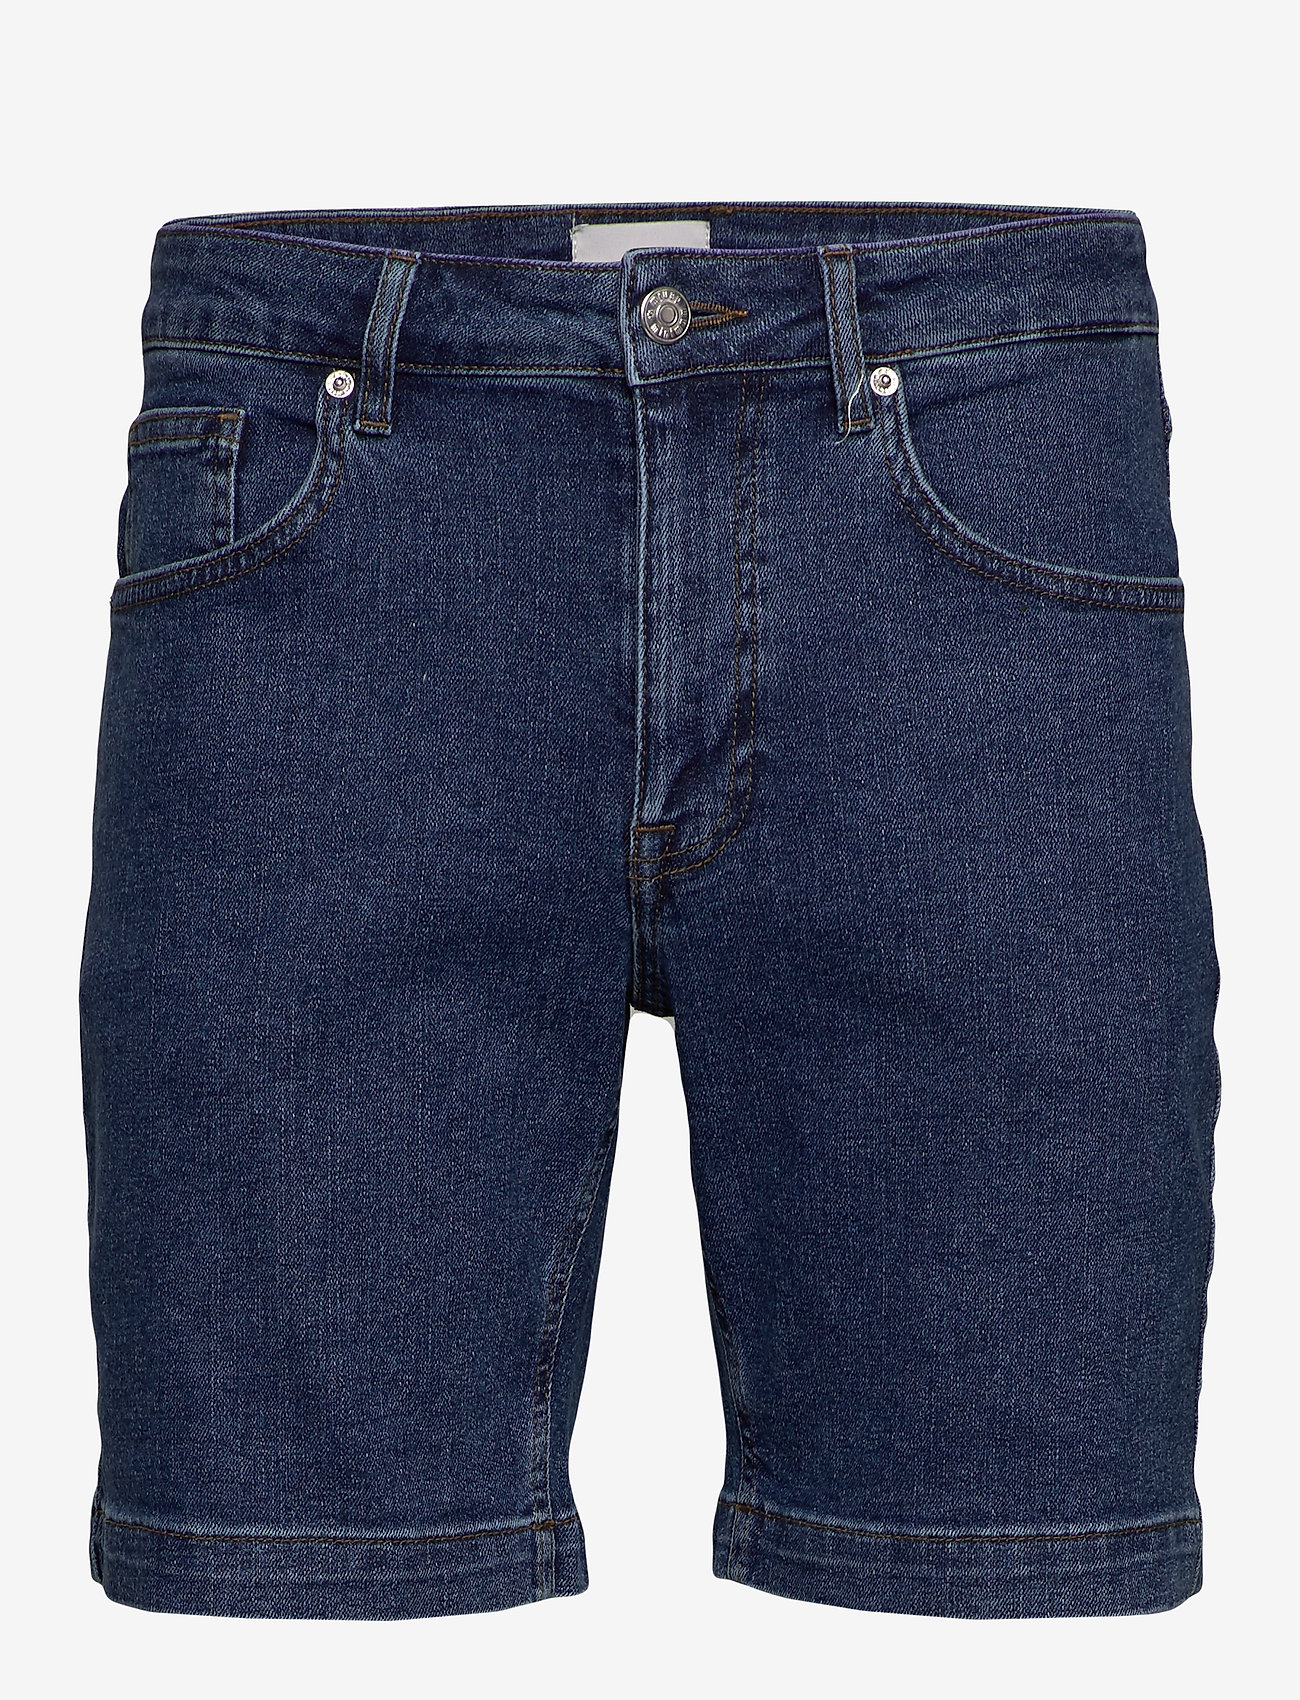 Minimum - samden - denim shorts - dark blue - 0